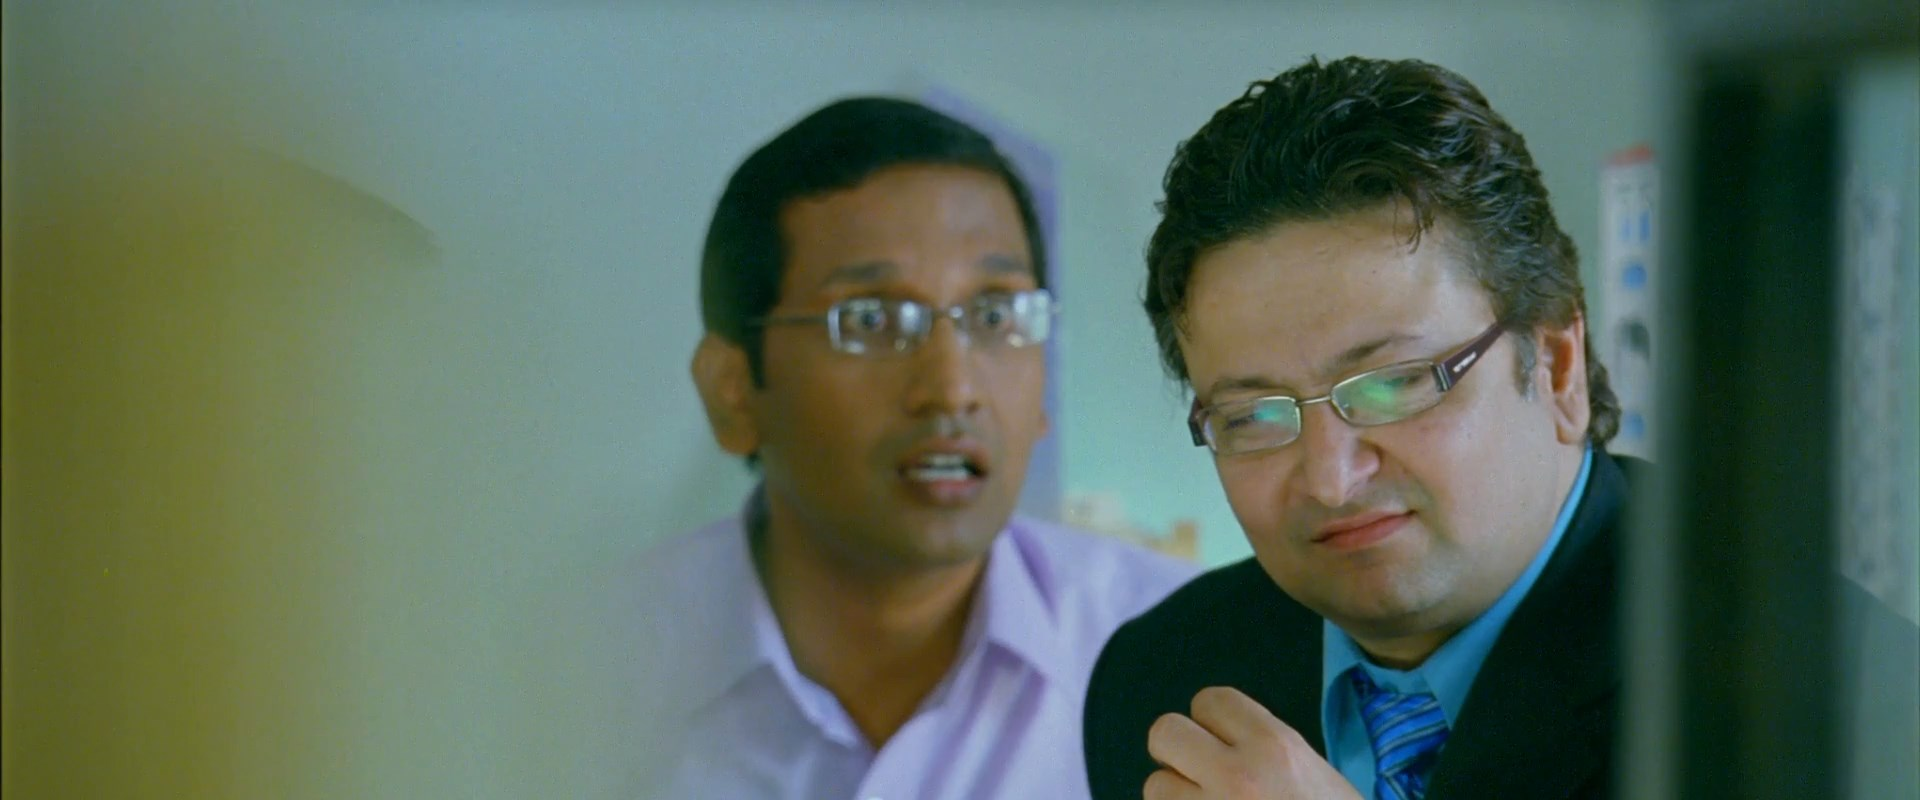 Ami Shubhash Bolchi.2020.Bangali.1080p.WEB DL.H264.AAC.D0T.Telly.mkv snapshot 01.23.42.000